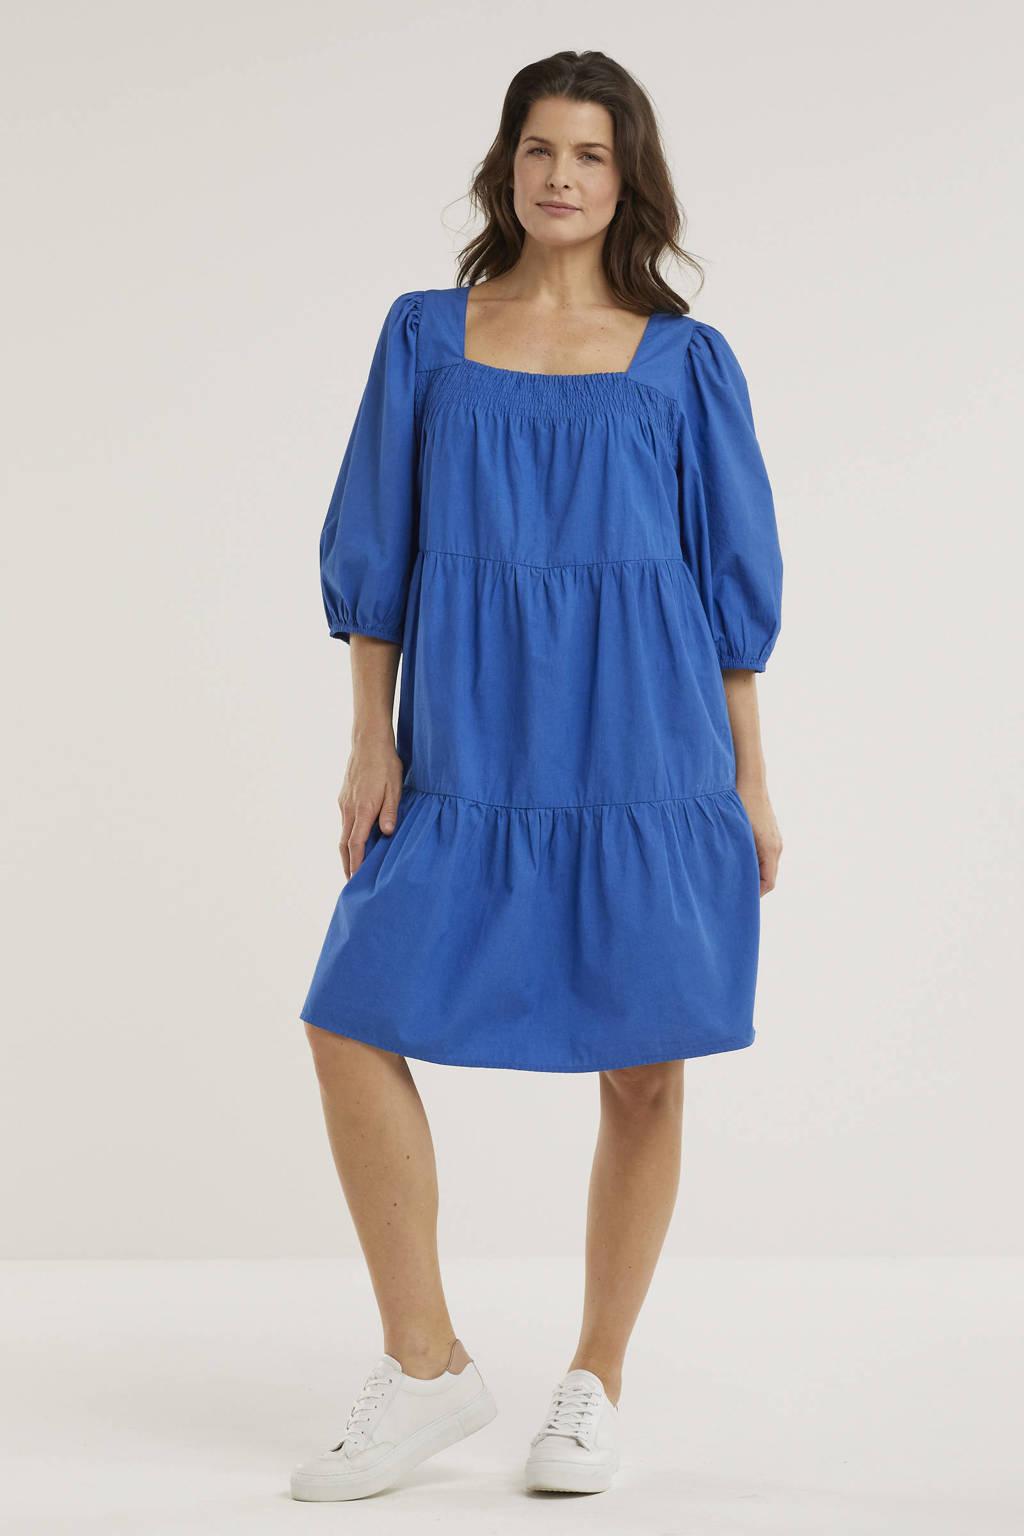 Peppercorn trapeze jurk Maddie Dress van biologisch katoen blauw, Blauw